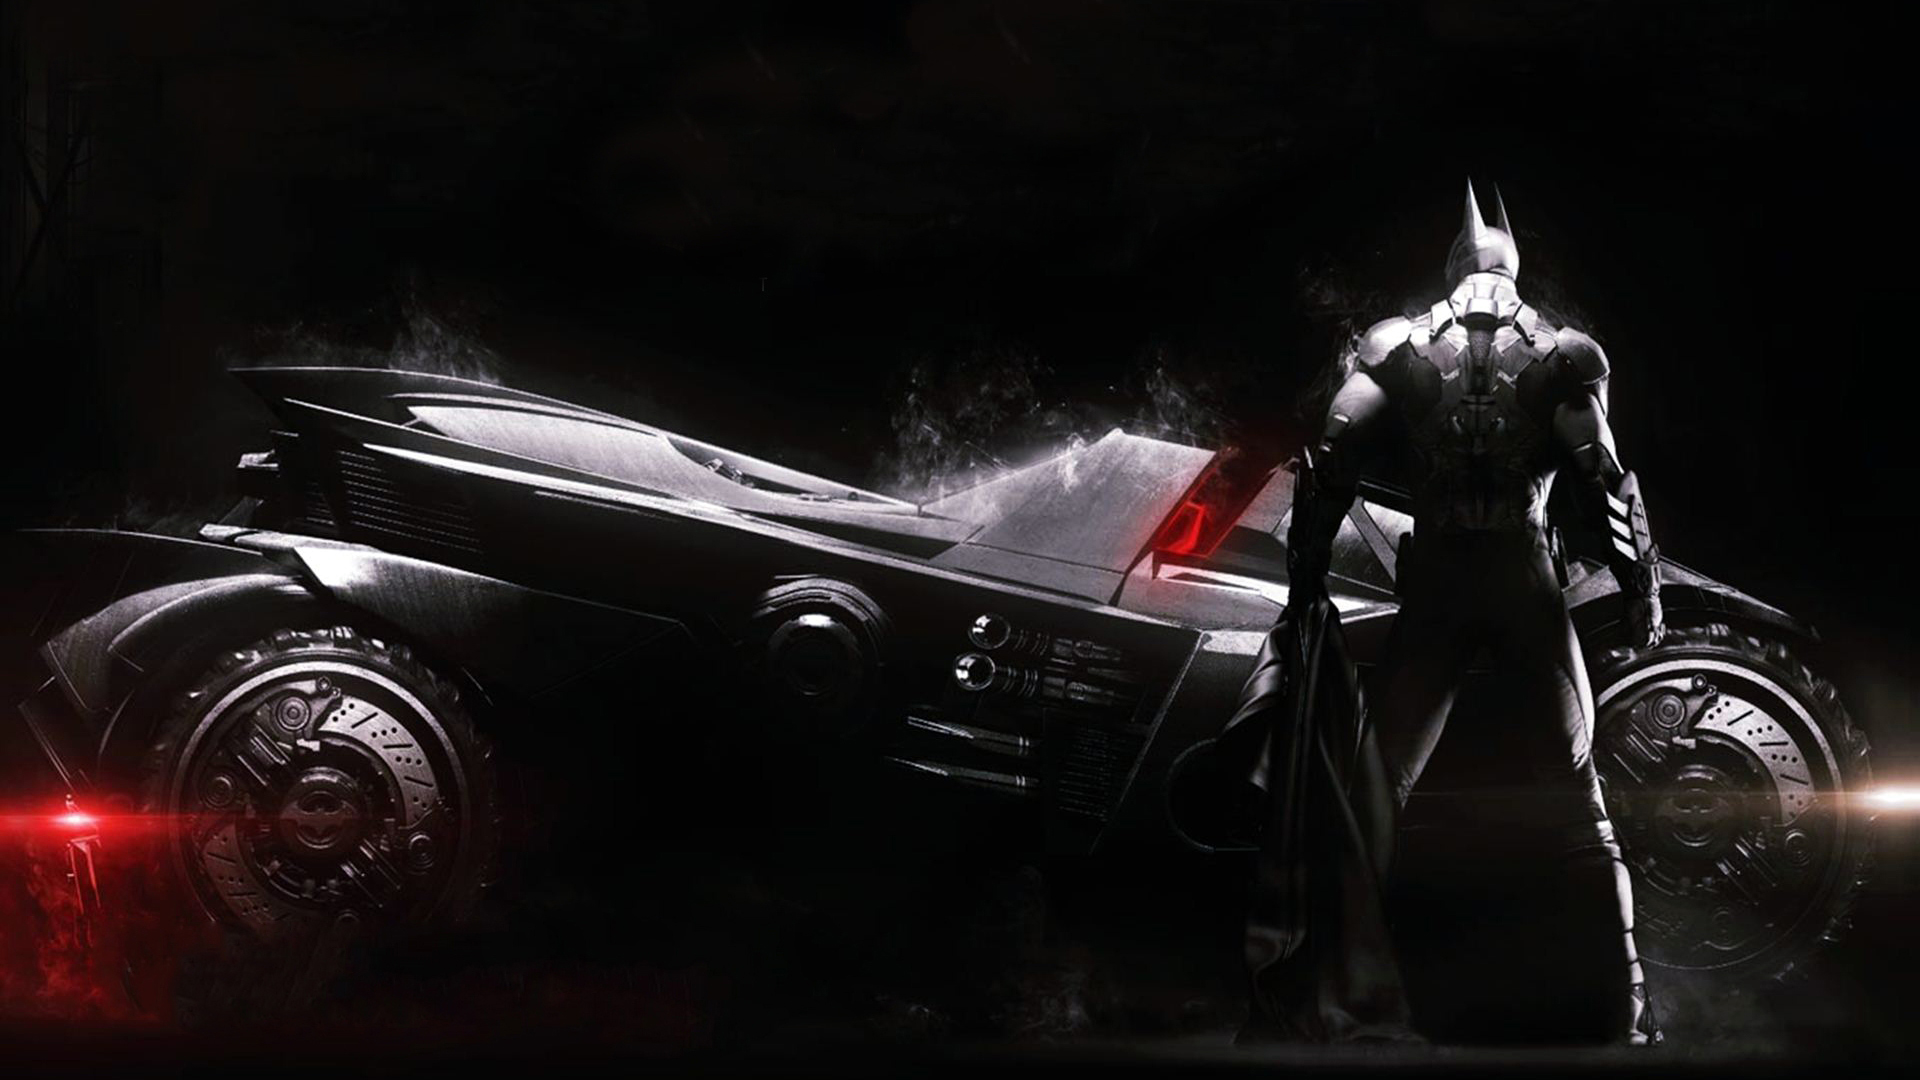 Batman and New Batmobile 2r Wallpaper HD